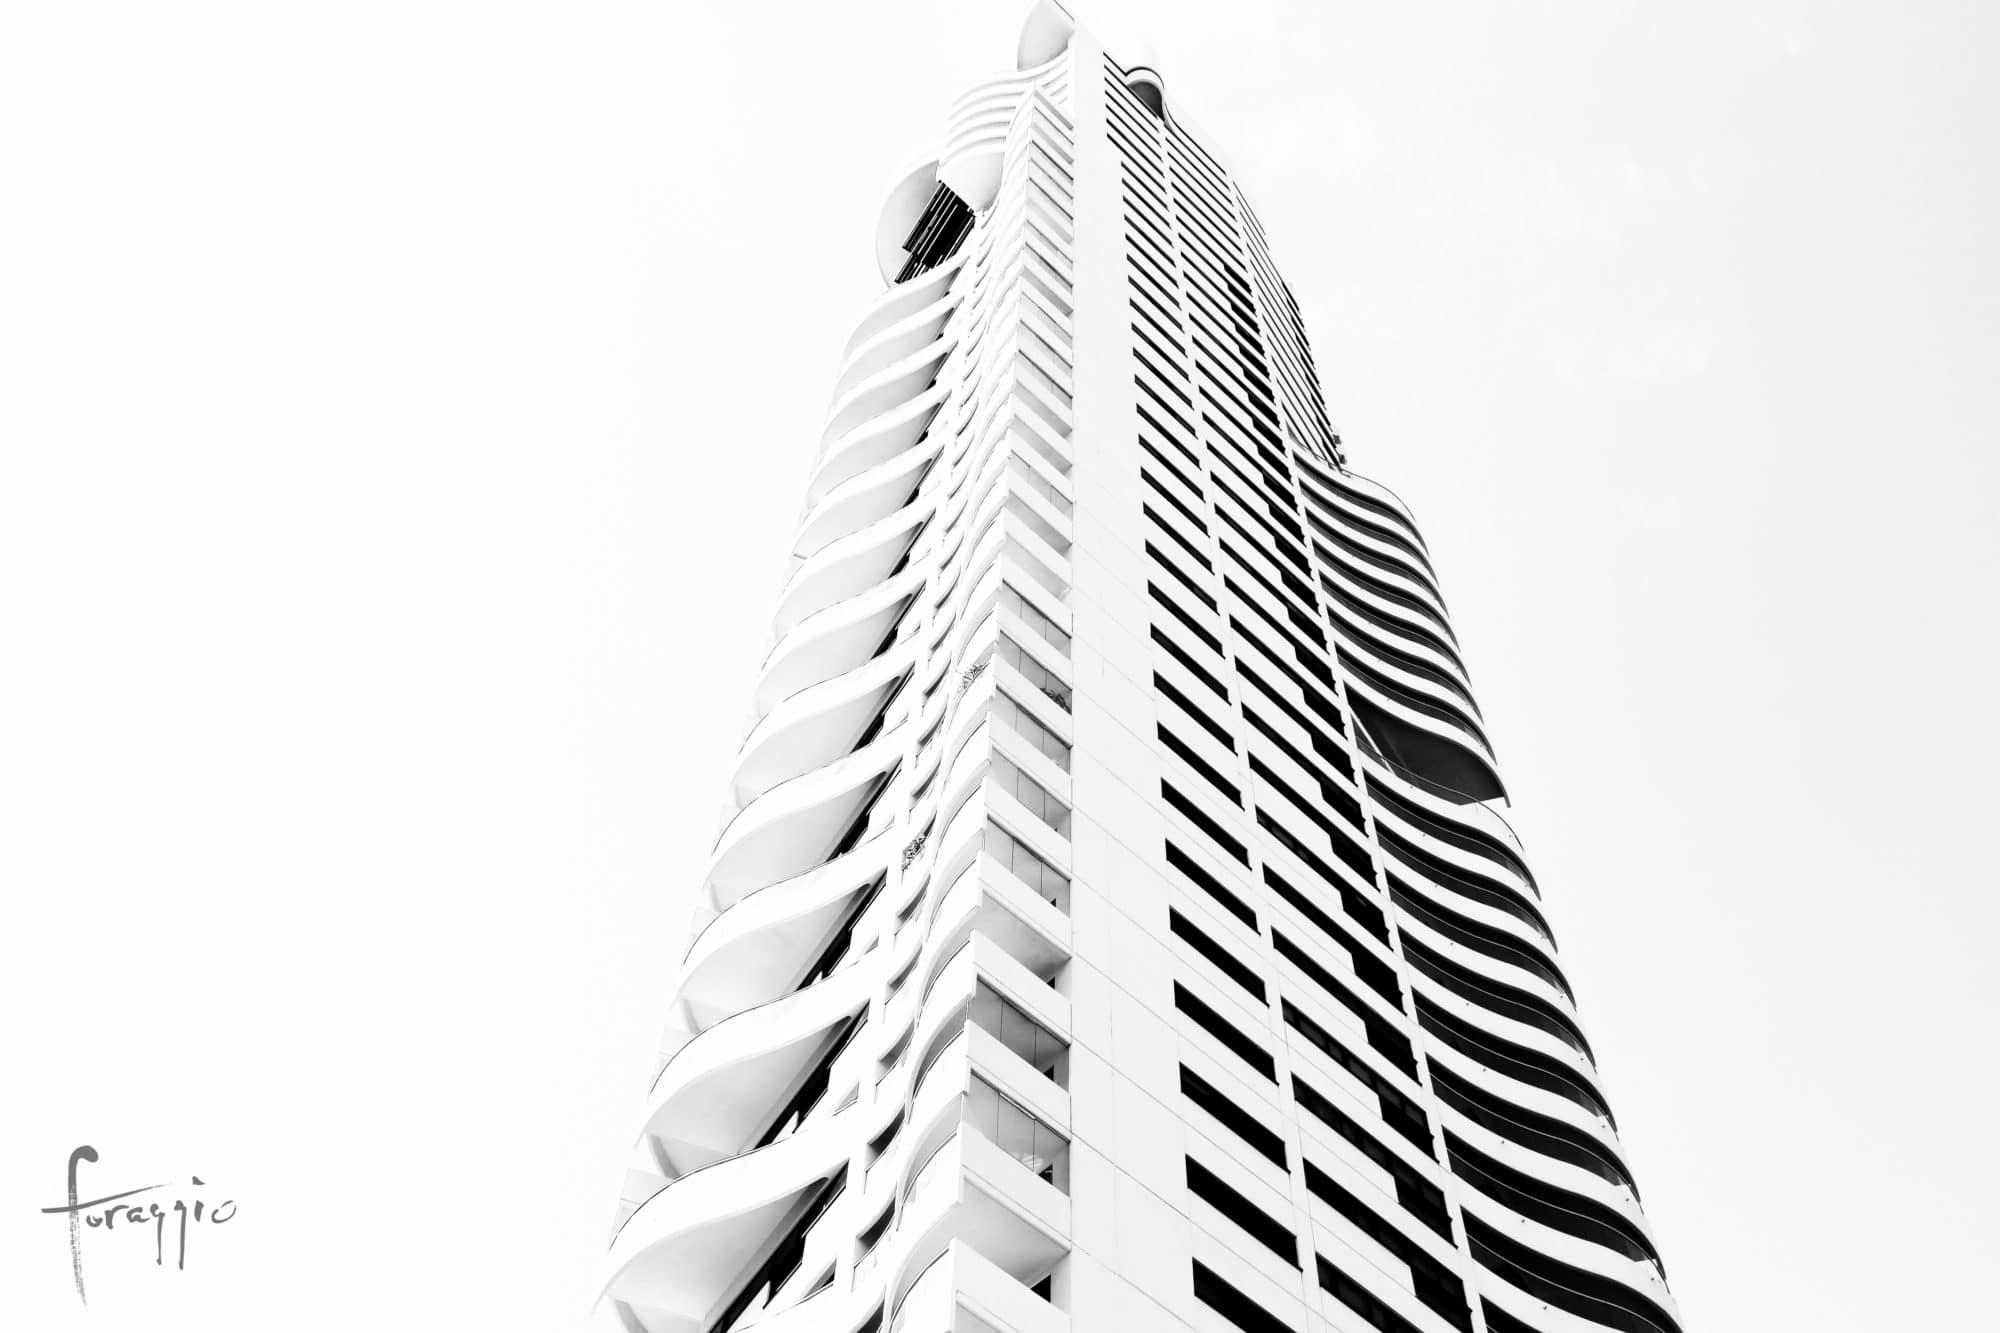 Starkitecture | Horizon, Sydney | Foraggio Photographic